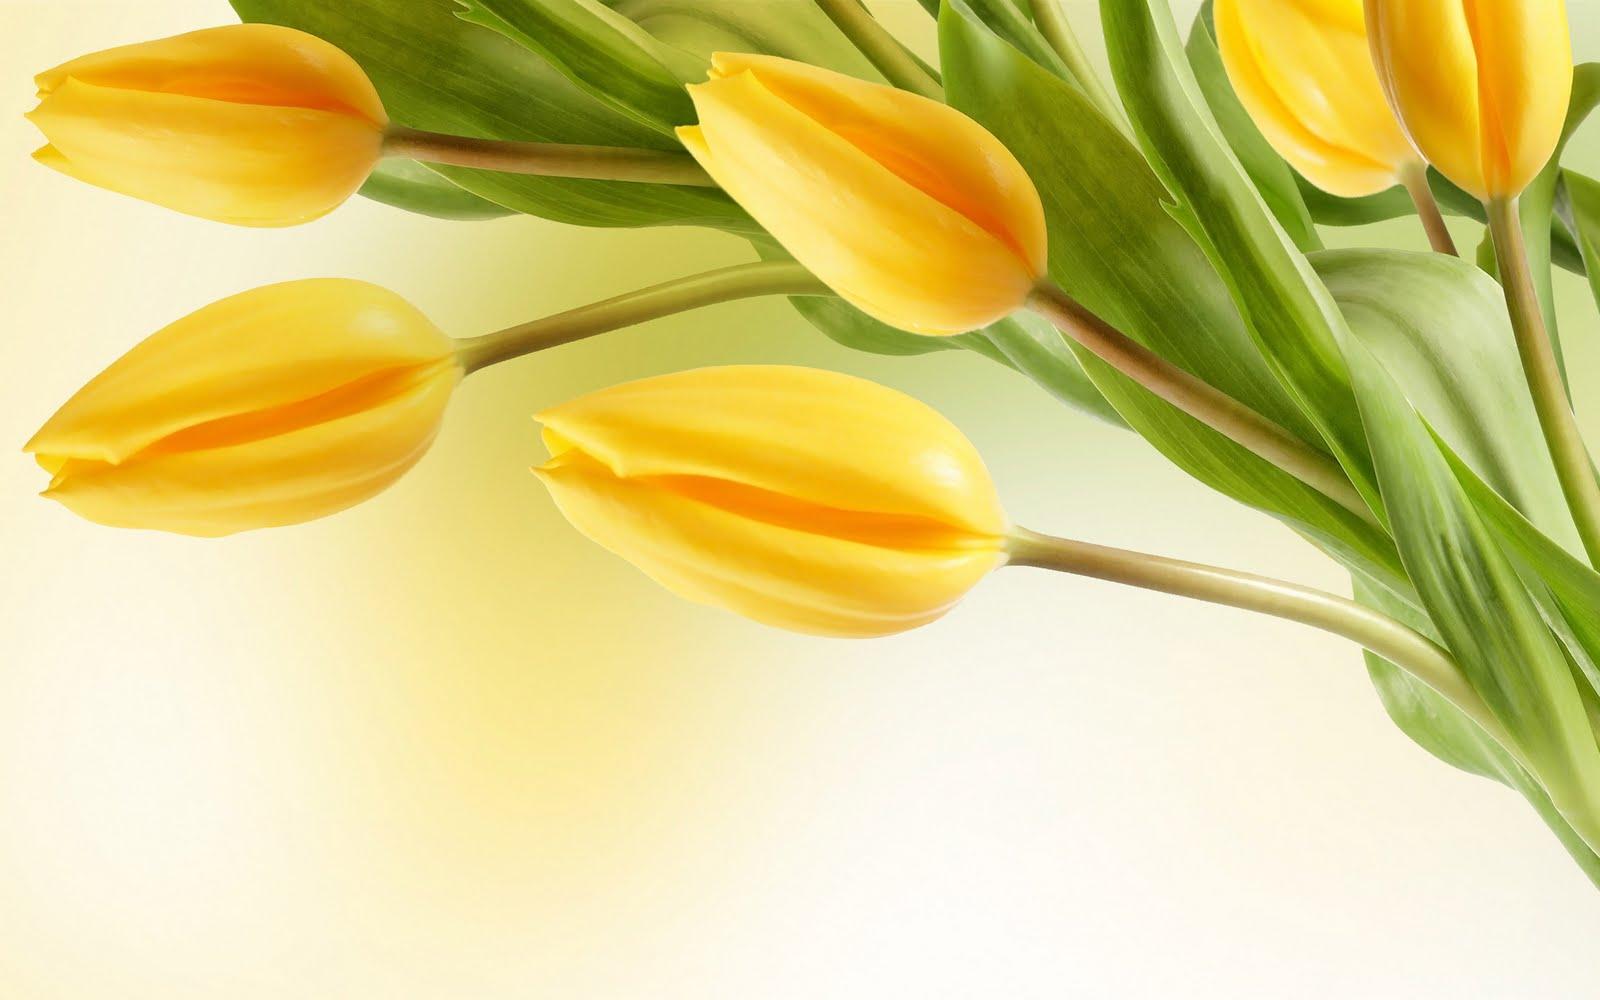 http://4.bp.blogspot.com/-yipQ3eWWaaI/Ti023z6MY0I/AAAAAAAADK8/ASzrdH3mNM0/s1600/Tulip+flowers+wallpaper-3.jpg